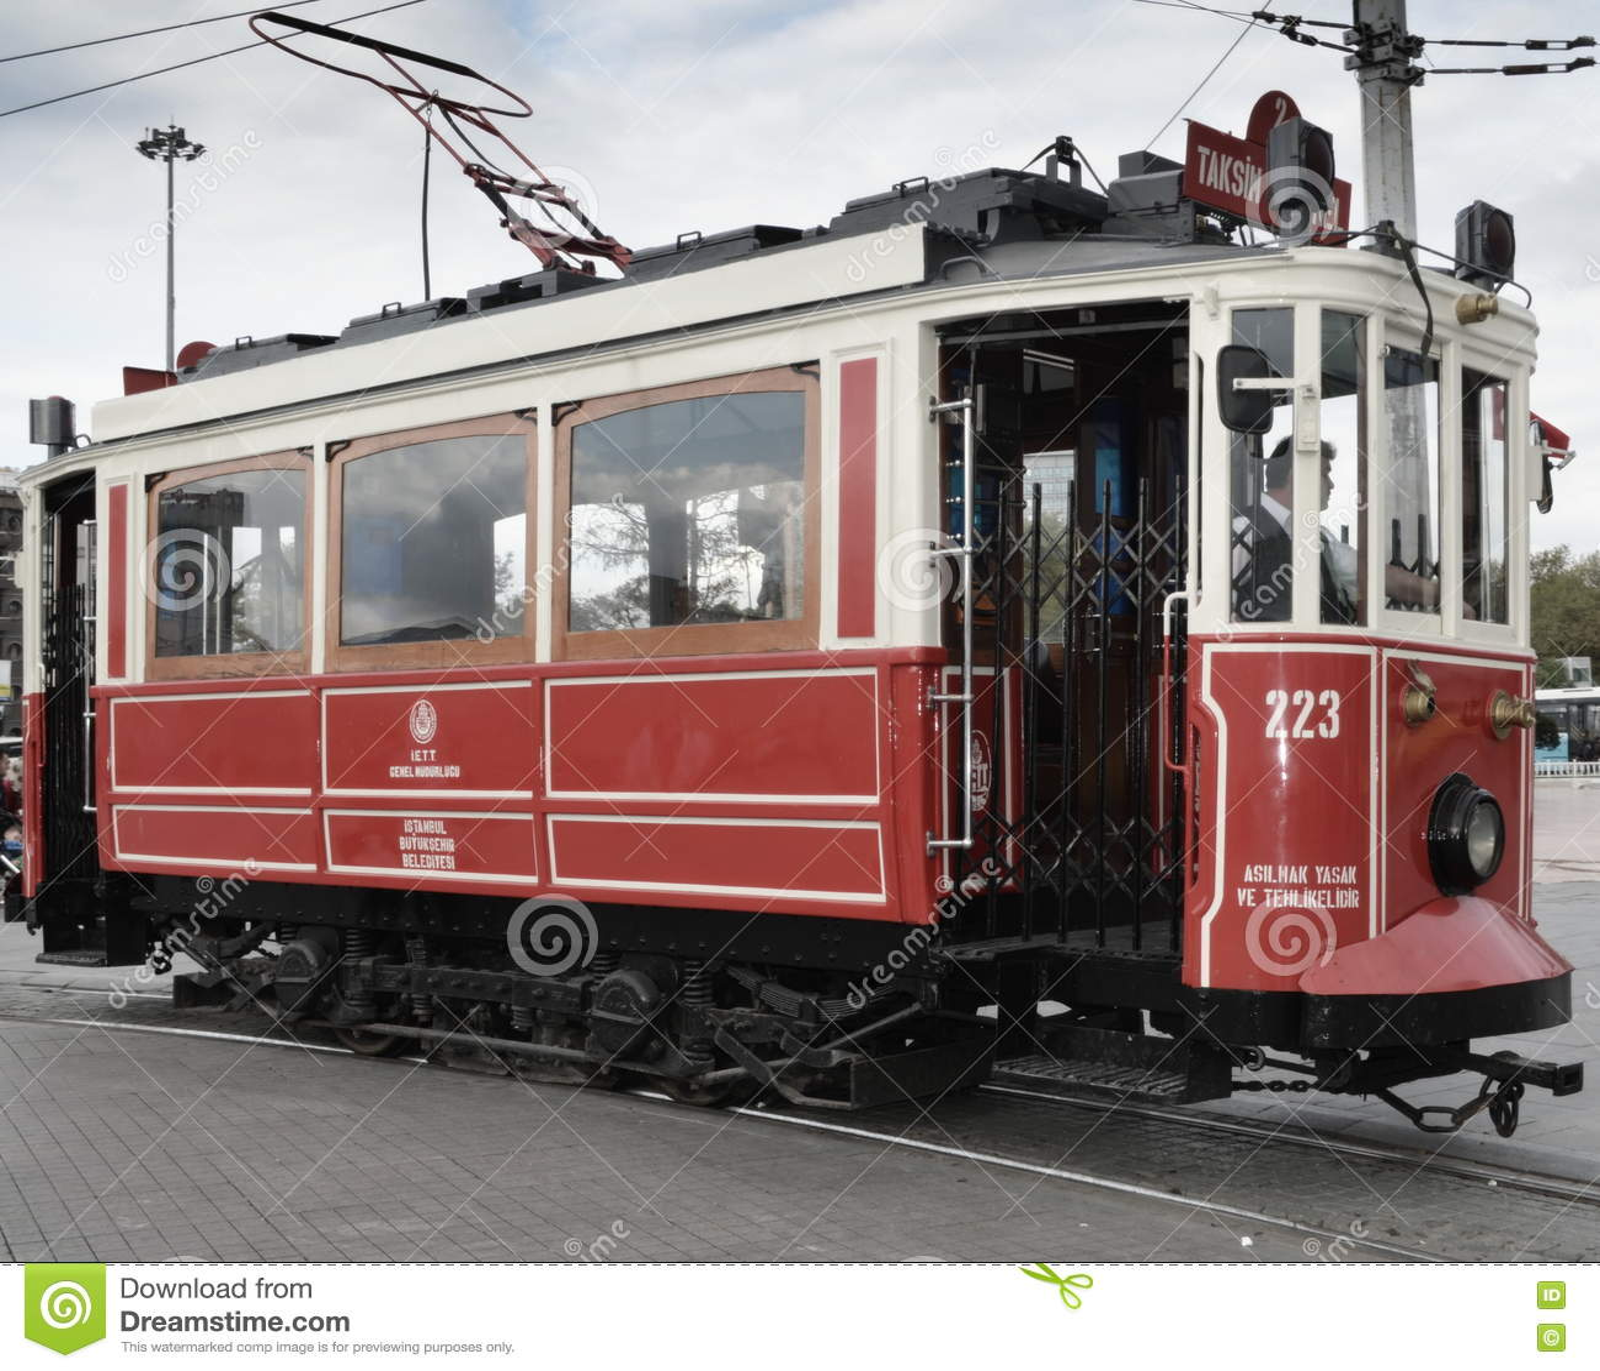 Исторический трамвай на бульваре Ä°stiklal